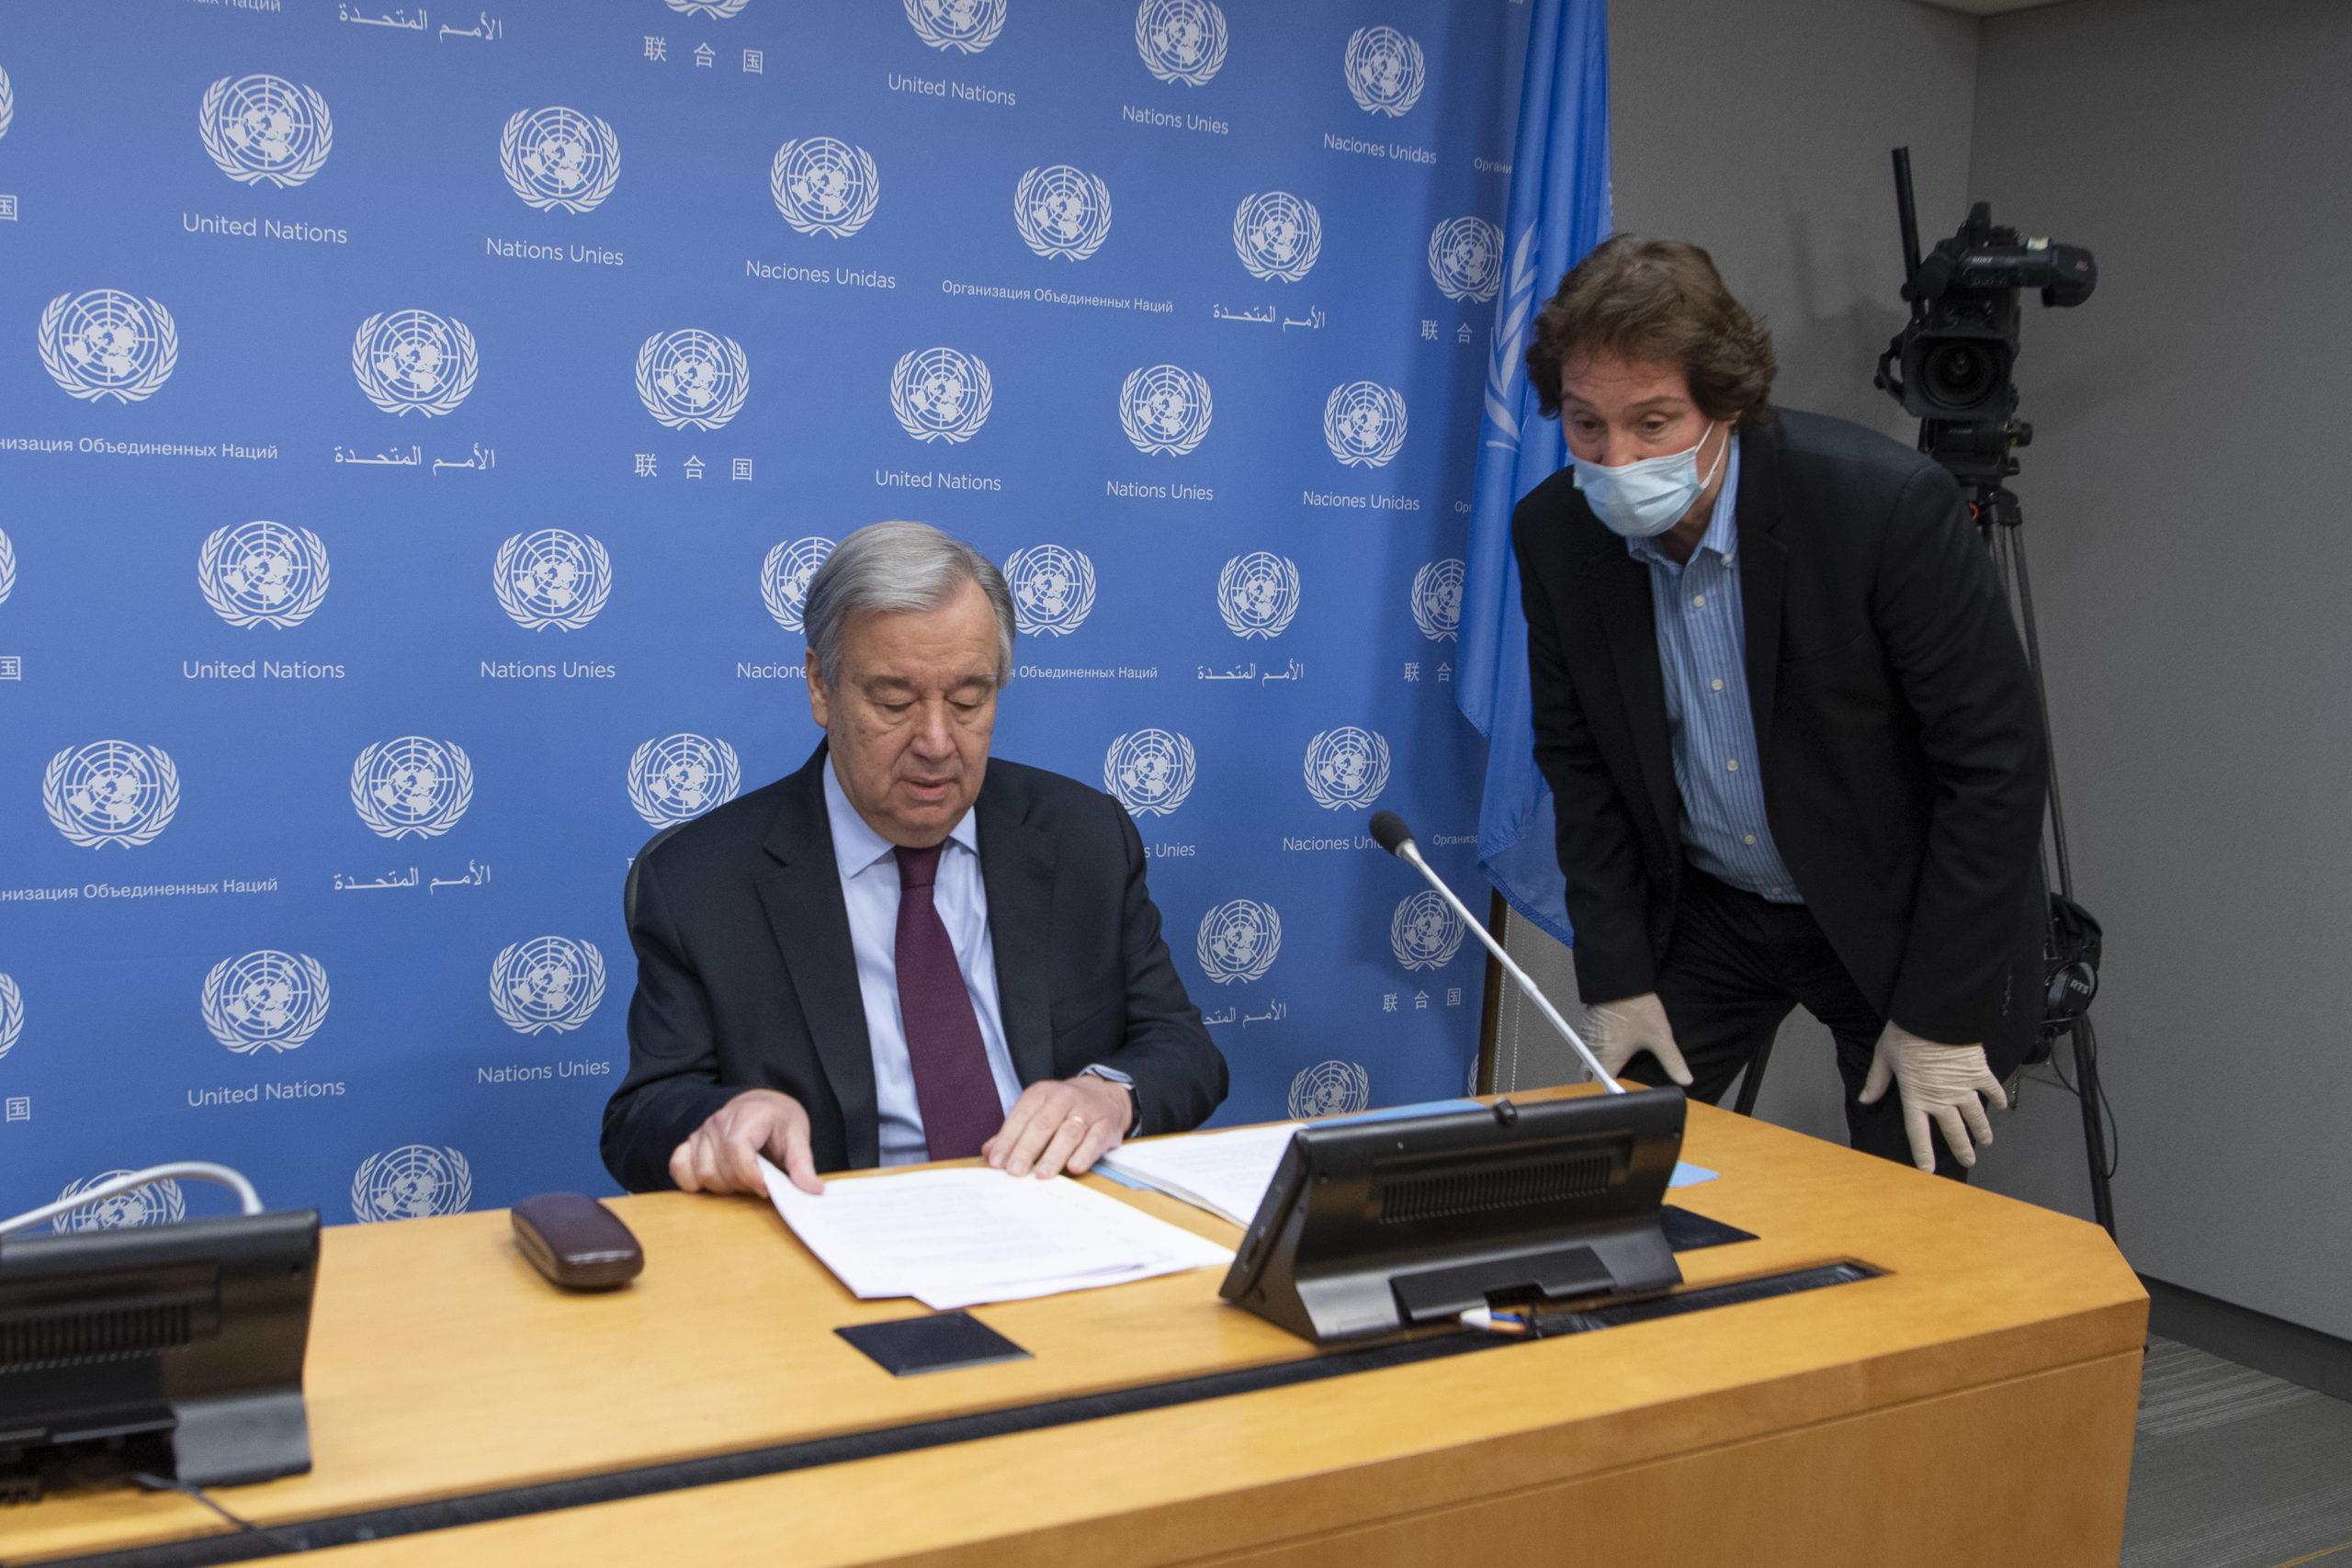 Secretary-General António Guterres (seated) speaks with a UNTV Studio Technician ahead of a virtual press conference. Credit: UN Photo/Eskinder Debebe